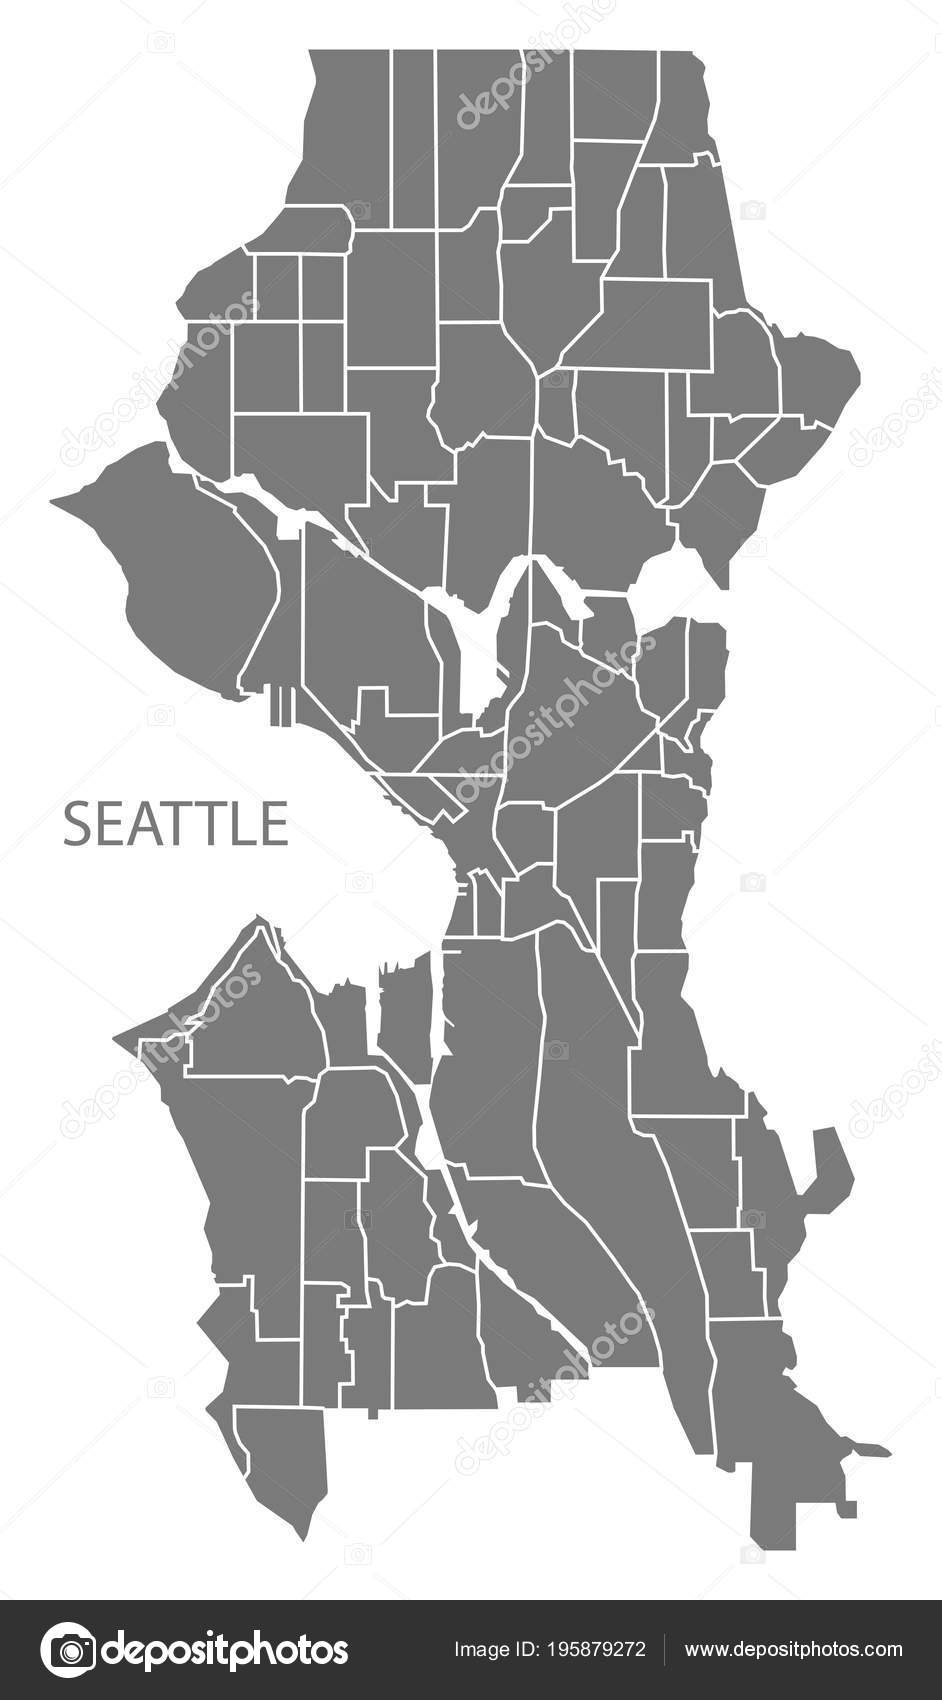 Seattle Washington City Map Neighborhoods Grey Illustration